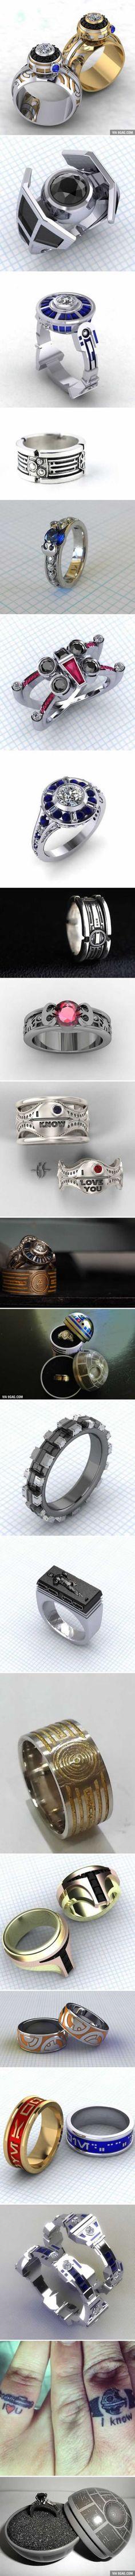 21 Most Romantic Star Wars Wedding Rings